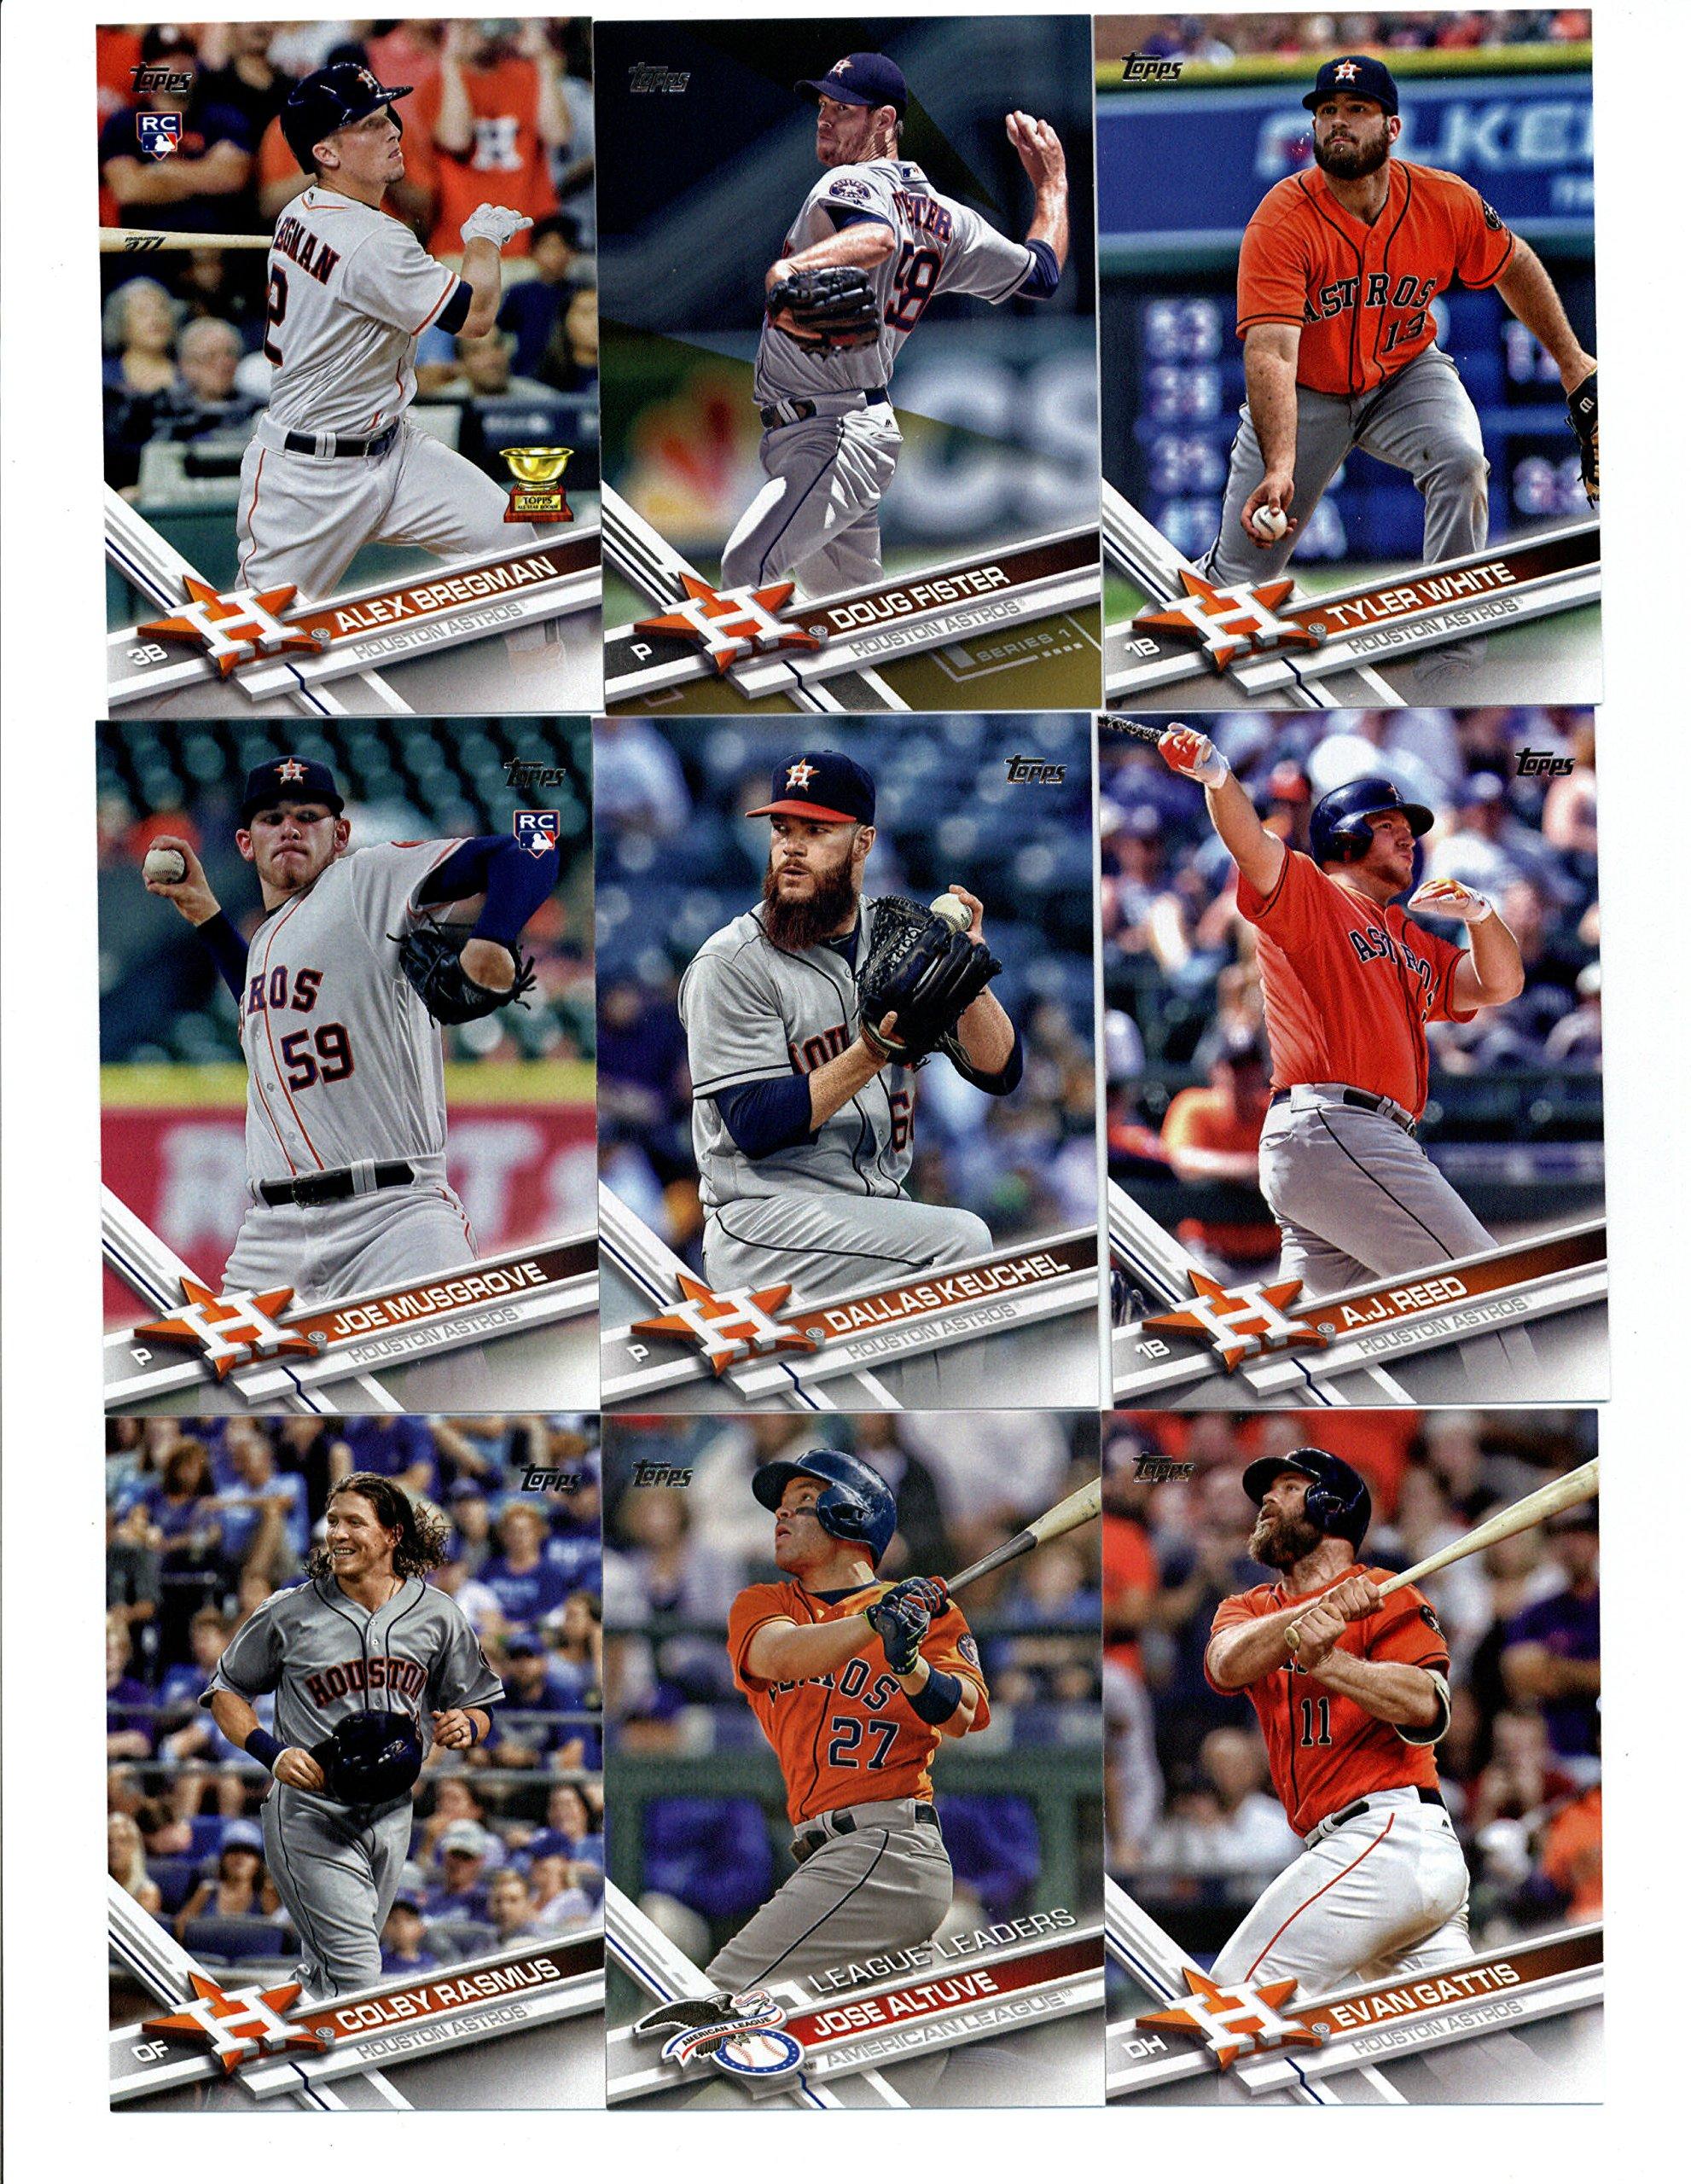 2017 Topps Series 1 Houston Astros Team Set of 15 Cards: Lance McCullers(#16), Teoscar Hernandez(#67), Carlos Correa(#75), Evan Gattis(#160), Houston Astros(#175), Colby Rasmus(#196), Jose Altuve(#214), Joe Musgrove(#219), Pat Neshek(#272), A.J. Reed(#273), Dallas Keuchel(#275), Tyler White(#285),